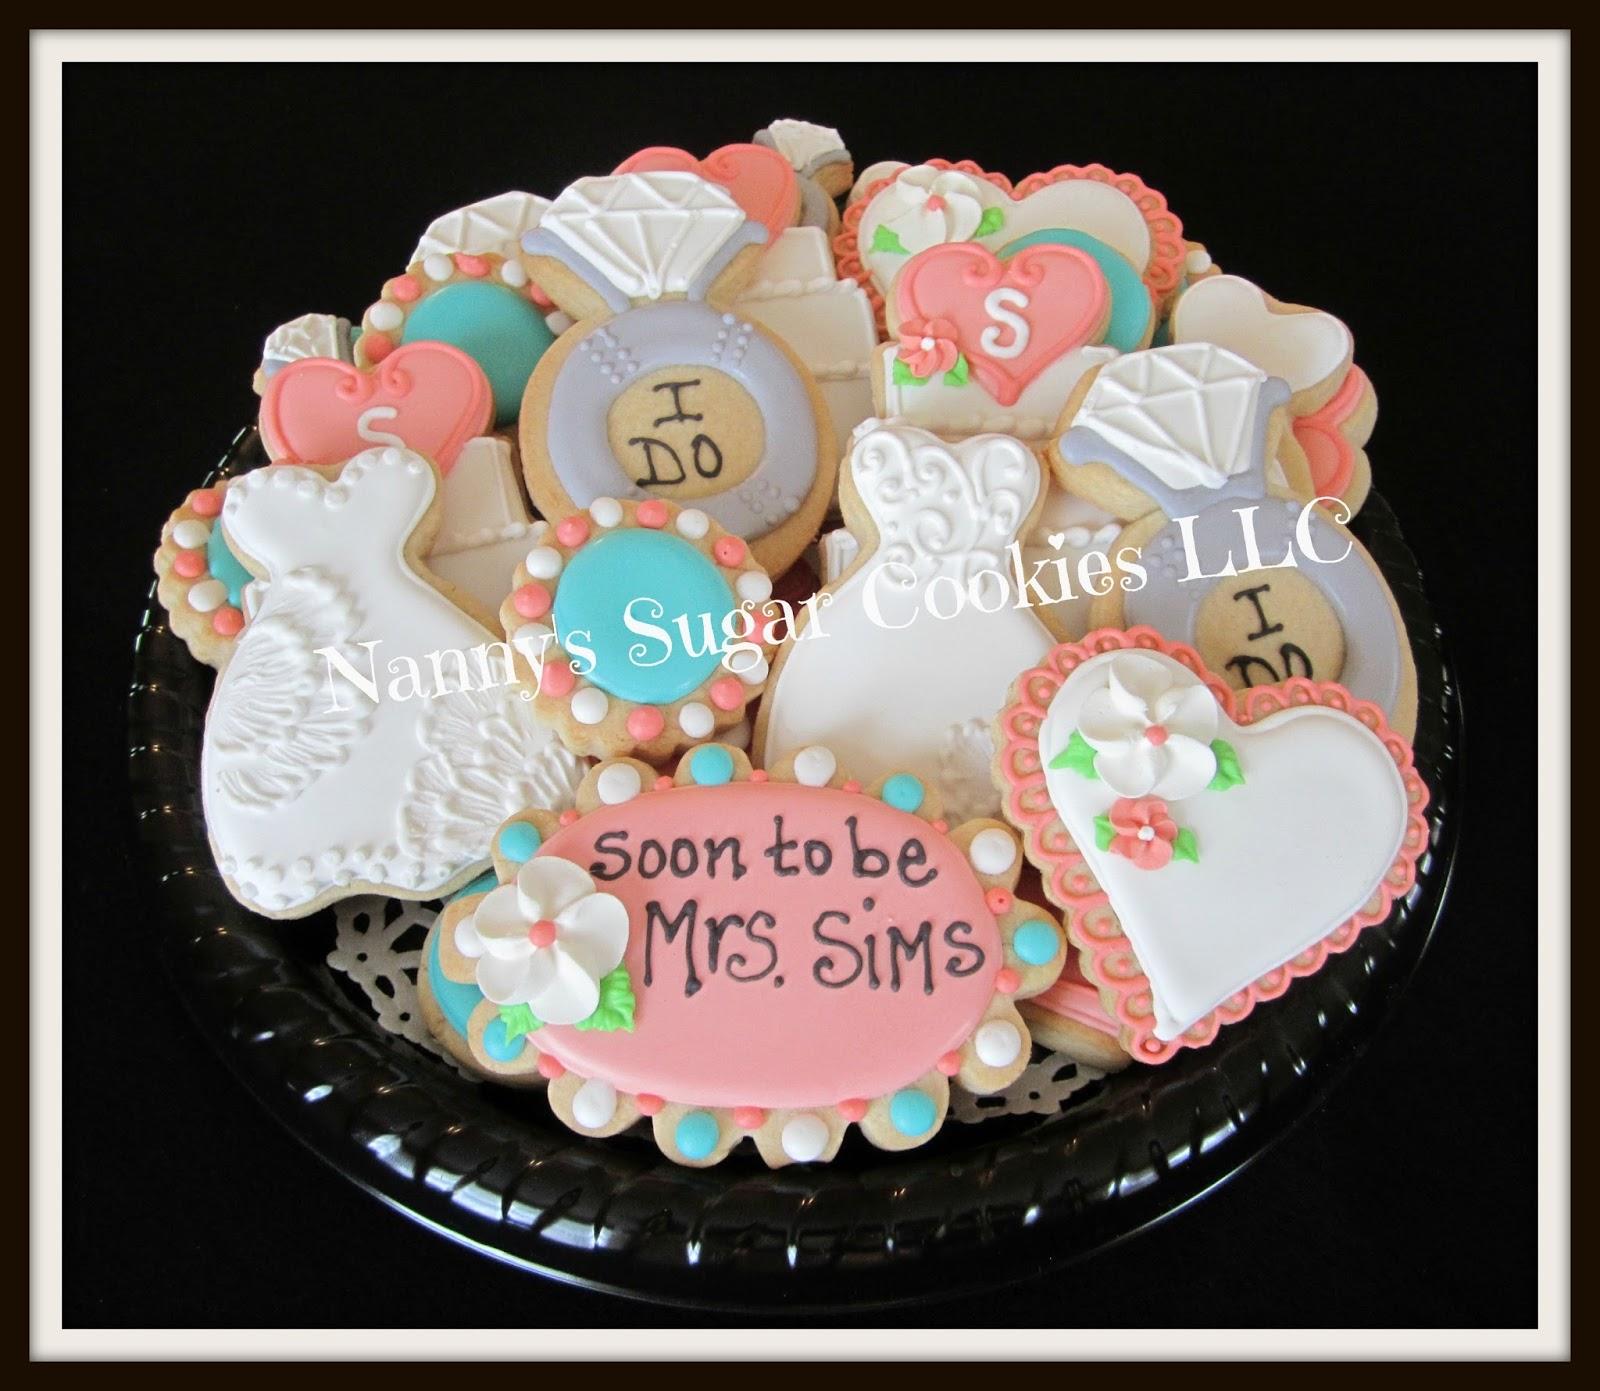 Standard Wedding Gift Amount: Nanny's Sugar Cookies LLC: Bridal Shower Cookie Platter